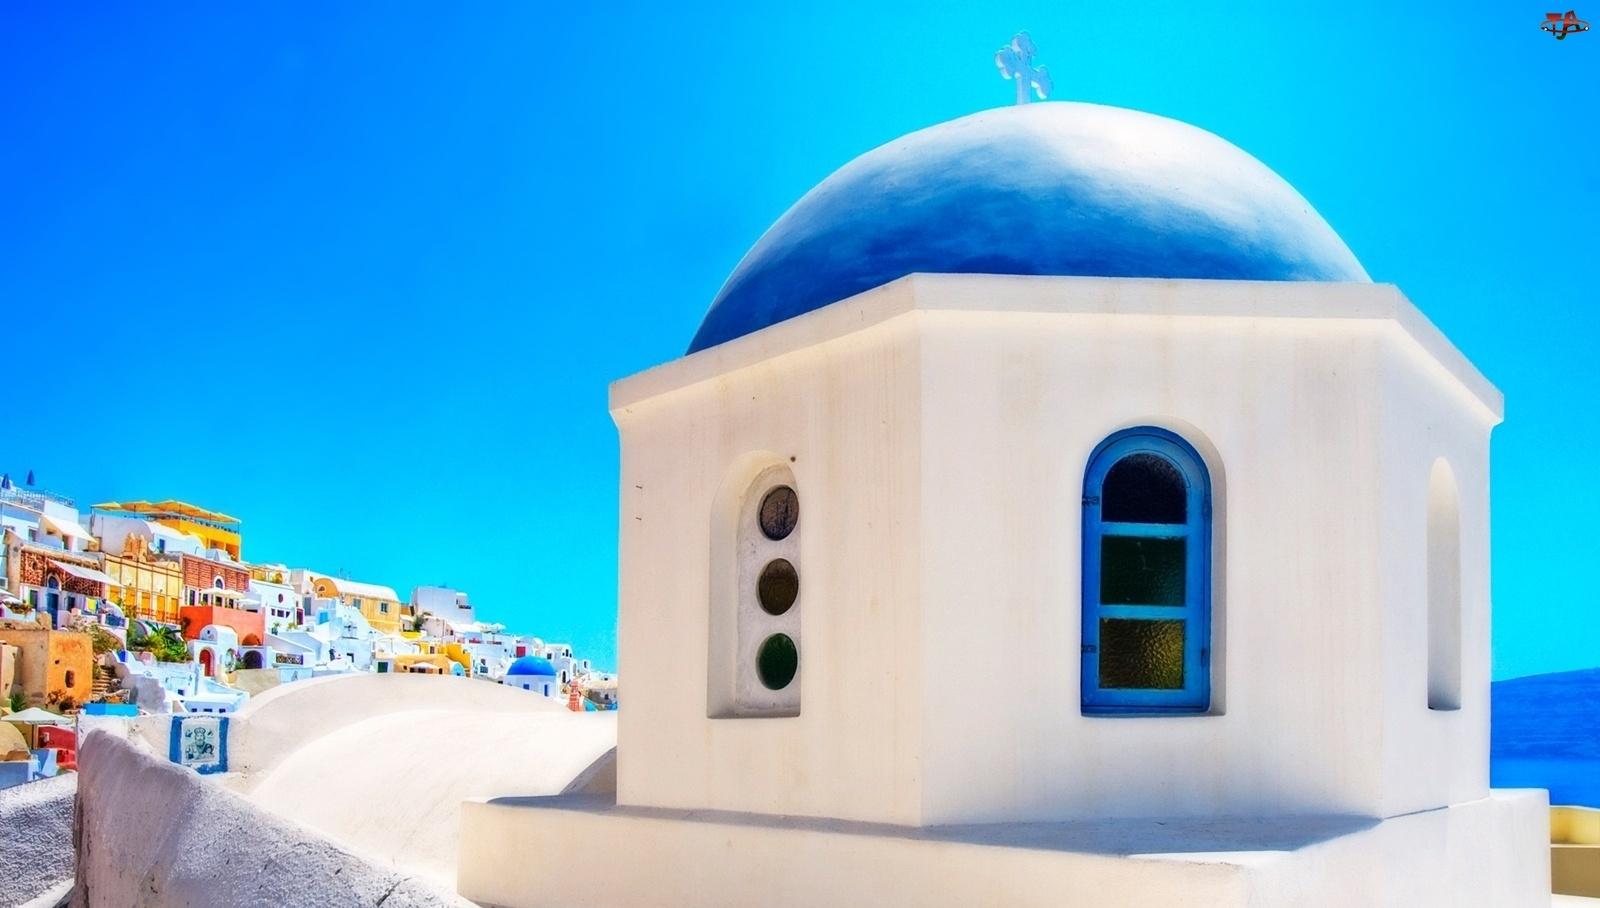 Kopuła, Cerkiew, Grecja, Santorini, Niebieska